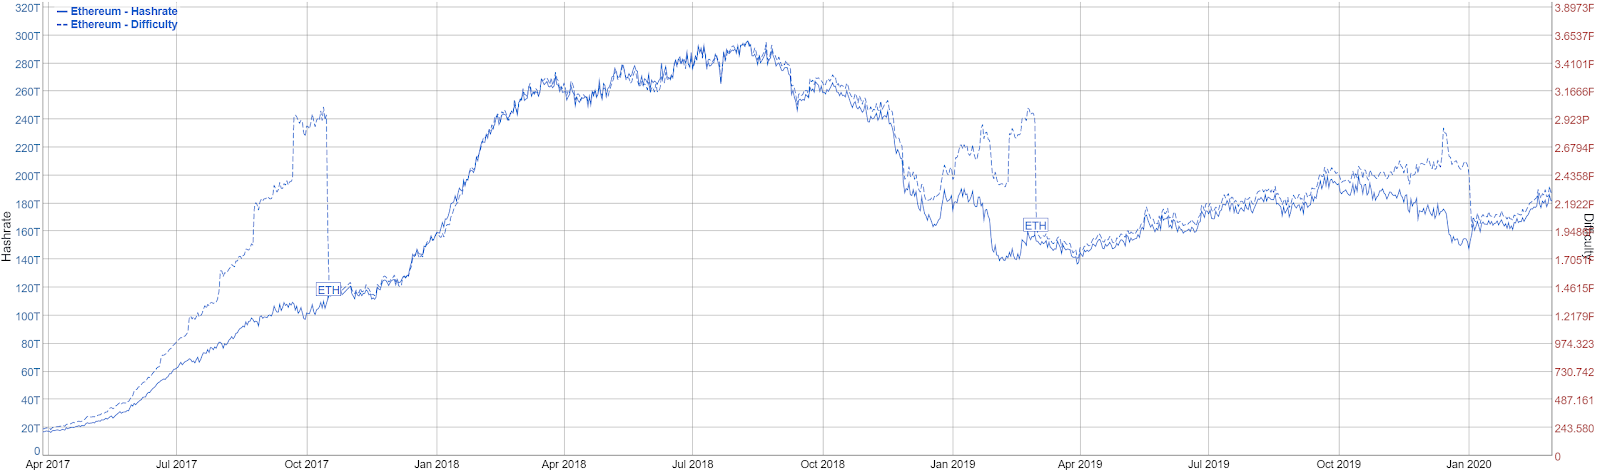 Ethereum Price Analysis 2 Mar 2020 (6)